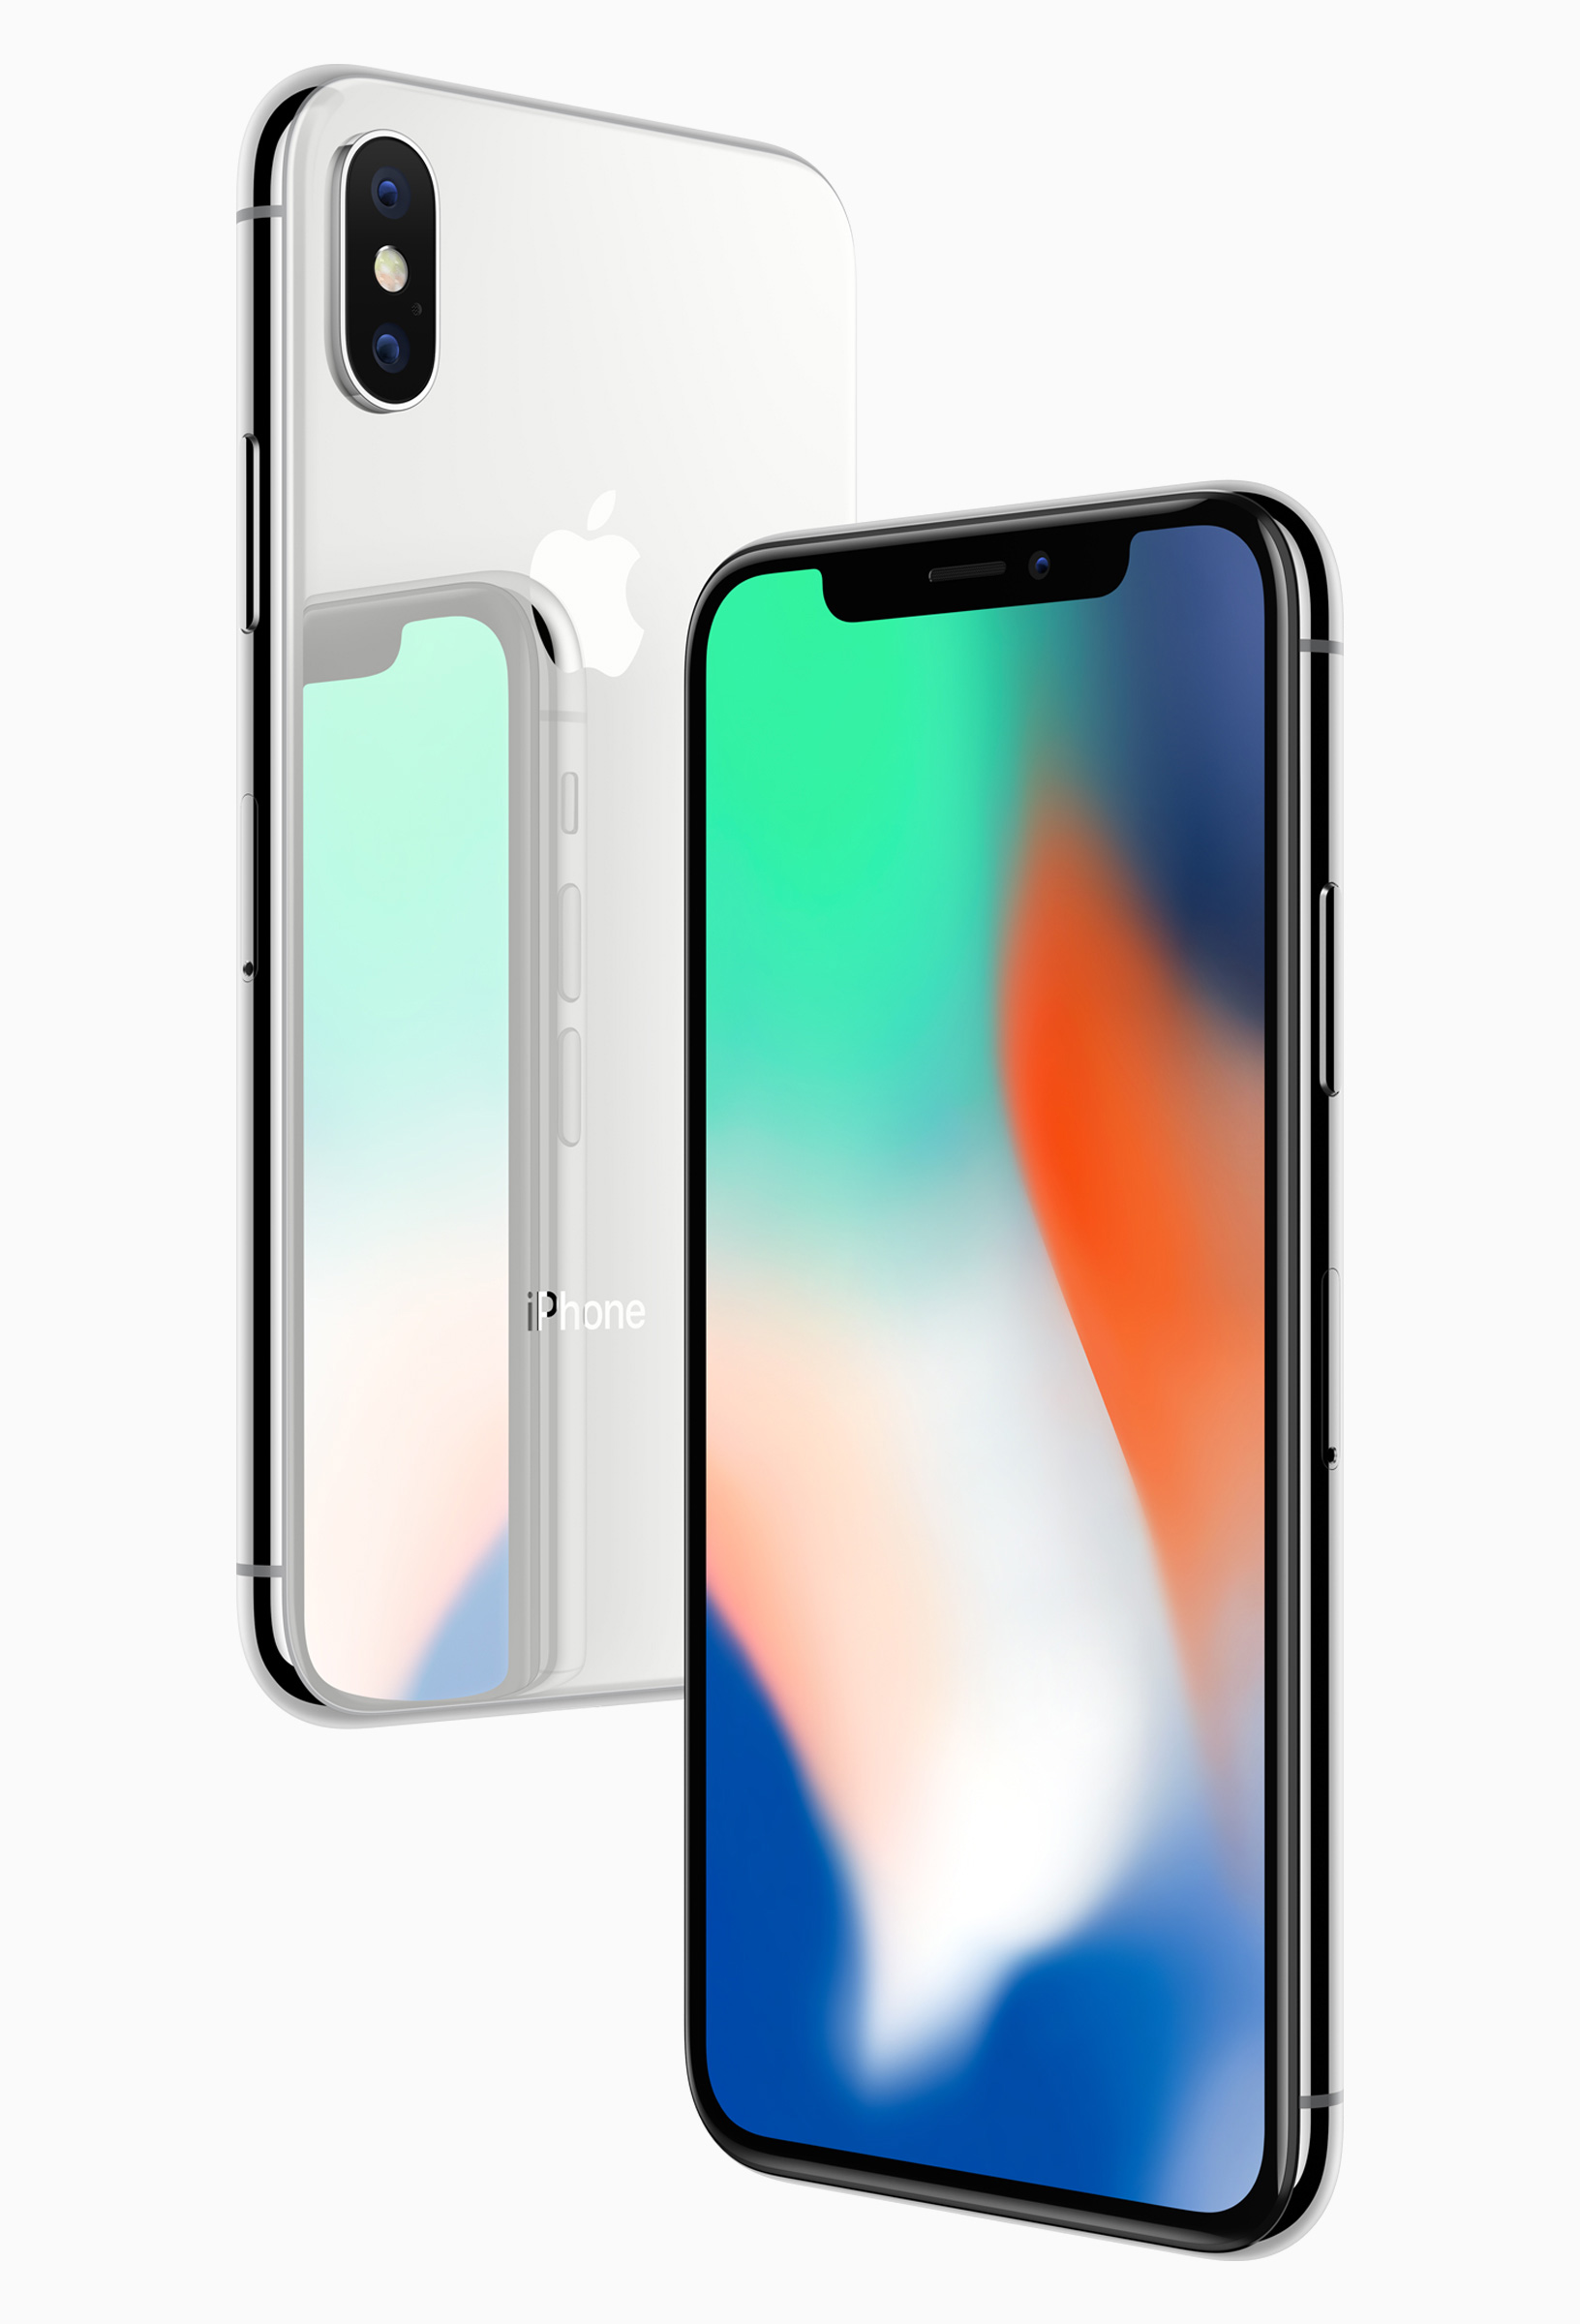 iPhone X all-glass design